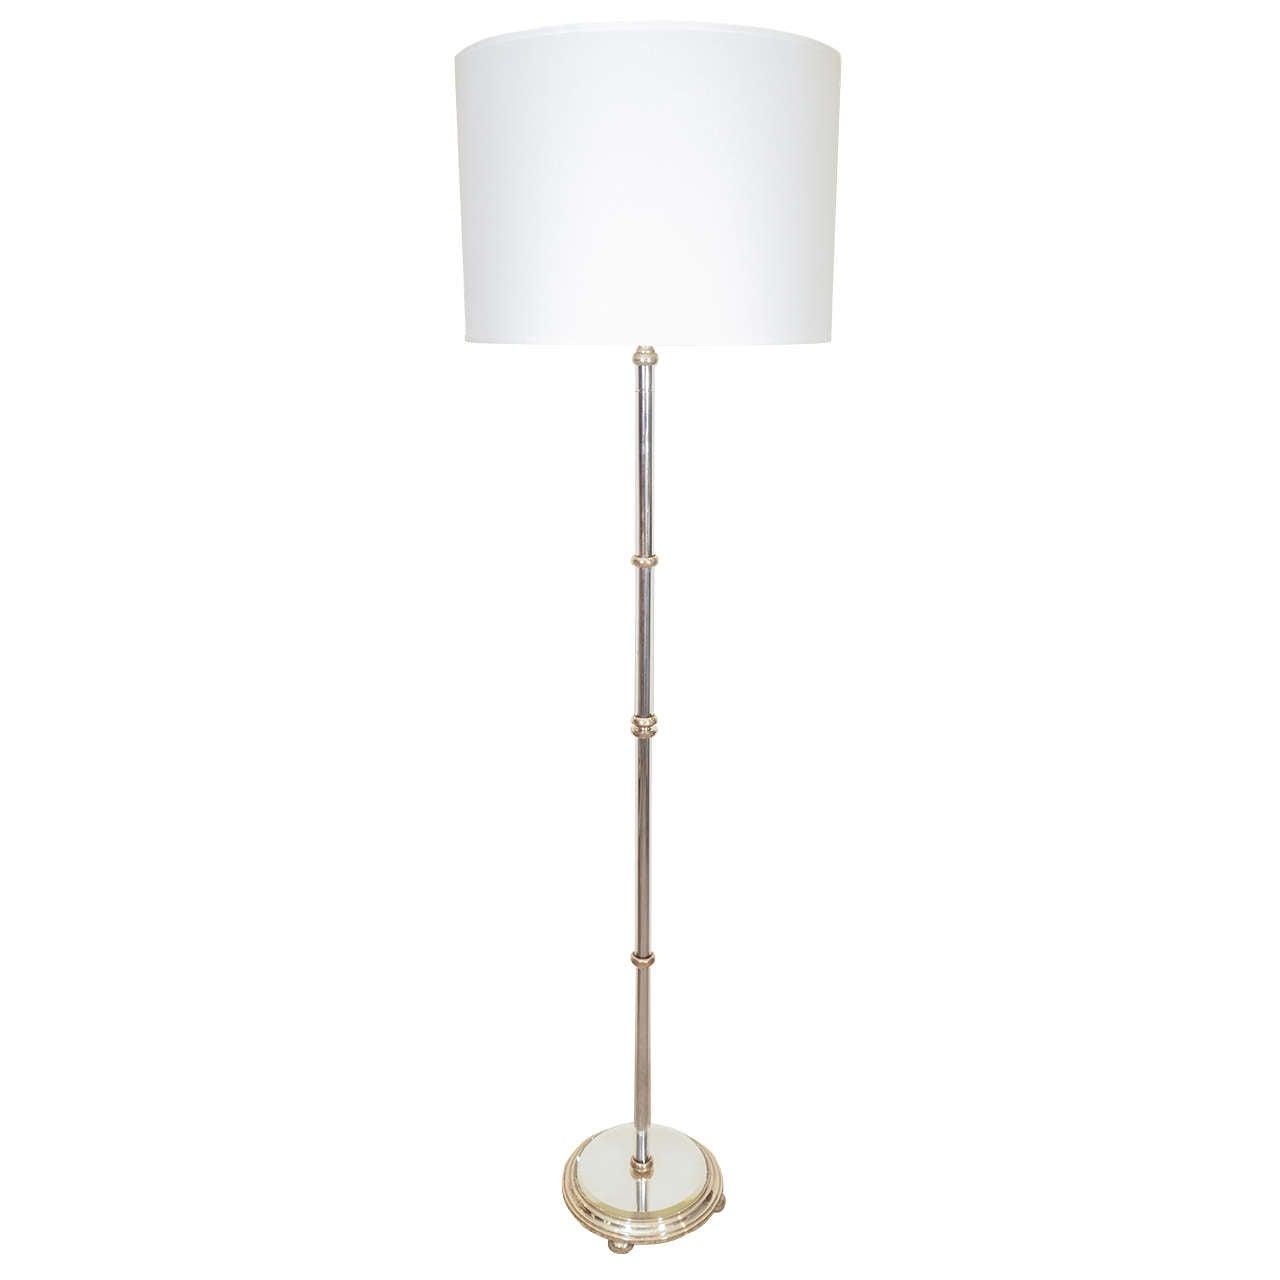 Chrome and nickel floor lamp at 1stdibs for Lexington floor lamp chrome